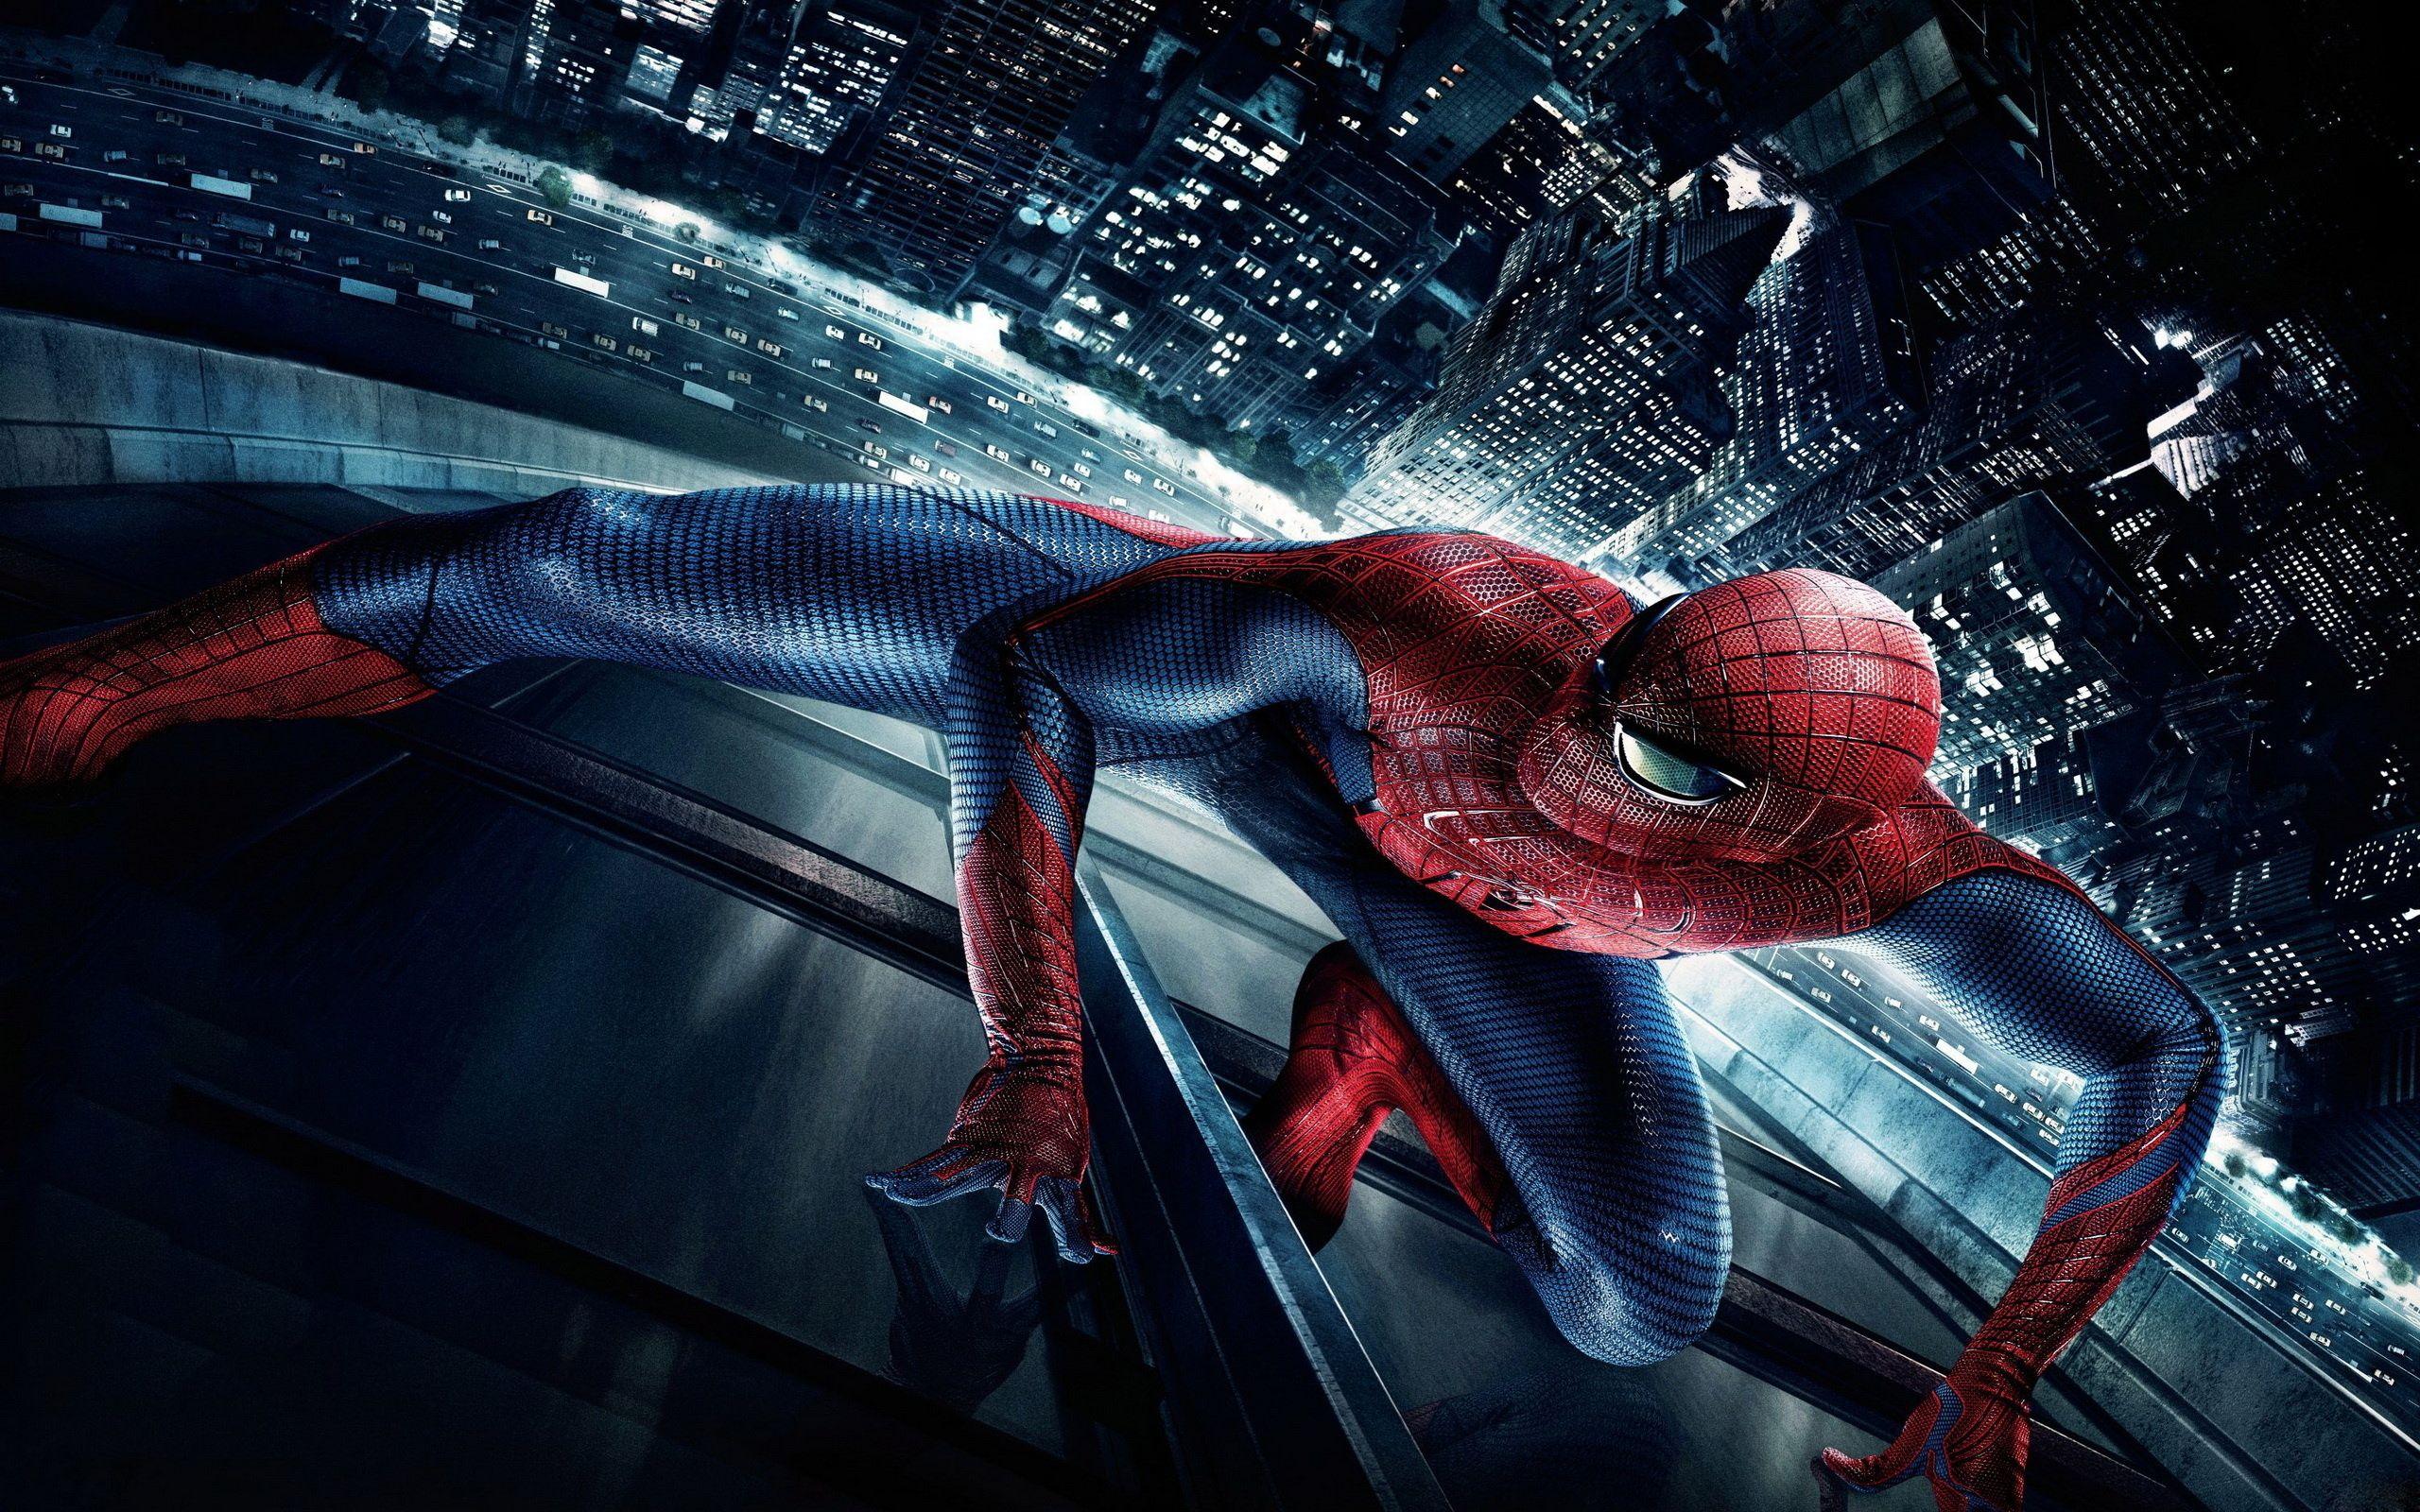 Amazing Spiderman Super Hero Desktop Wallpaper 2560x1600 Via Classy Bro